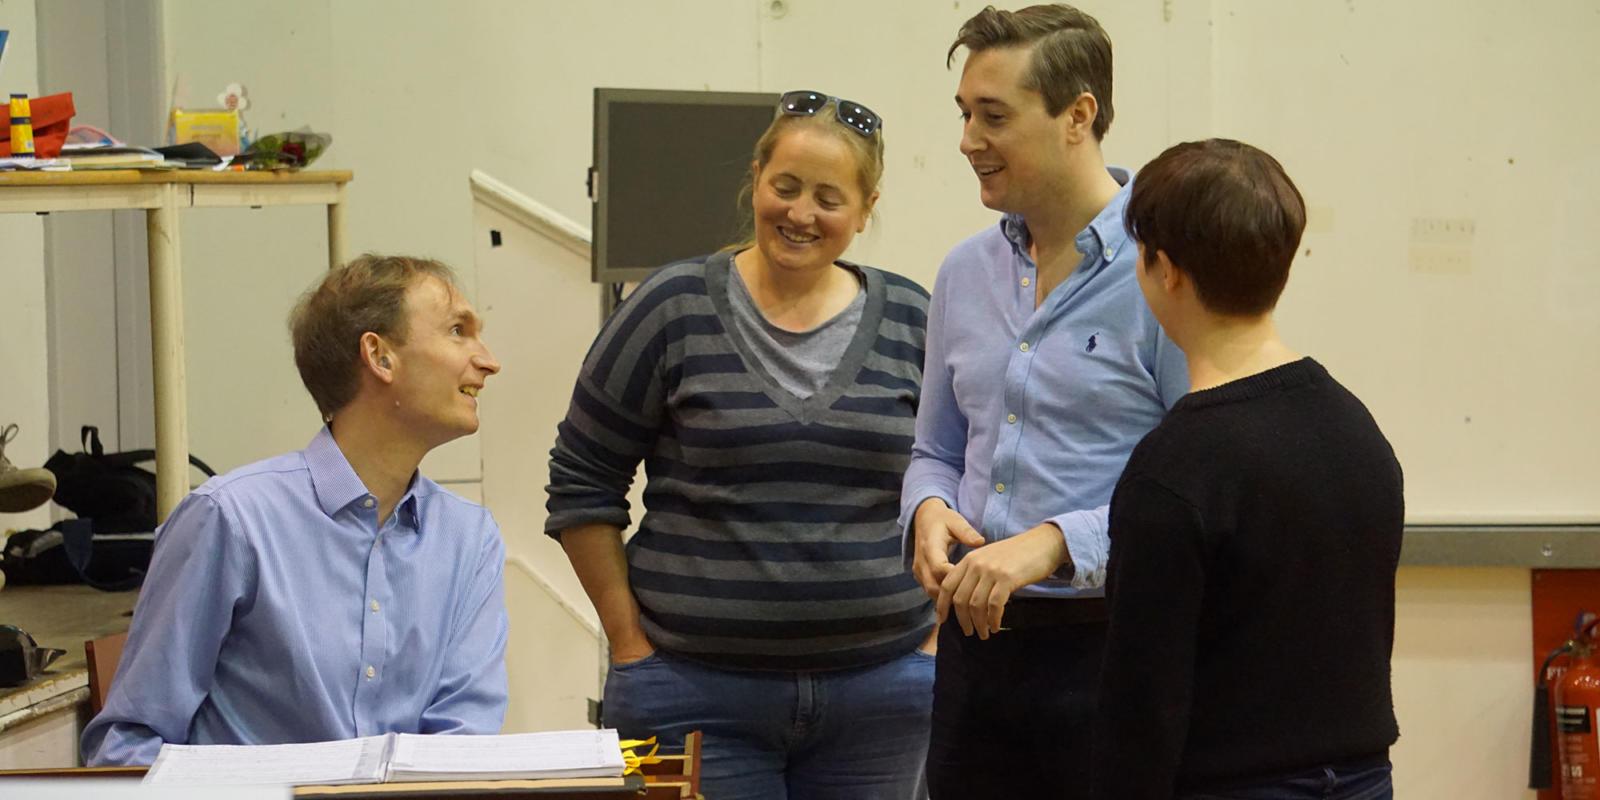 ENO Studio Live: Acis and Galatea - Nicholas Ansdell-Evans with Rosie Davis, Bradley Smith and Director Sarah Tipple